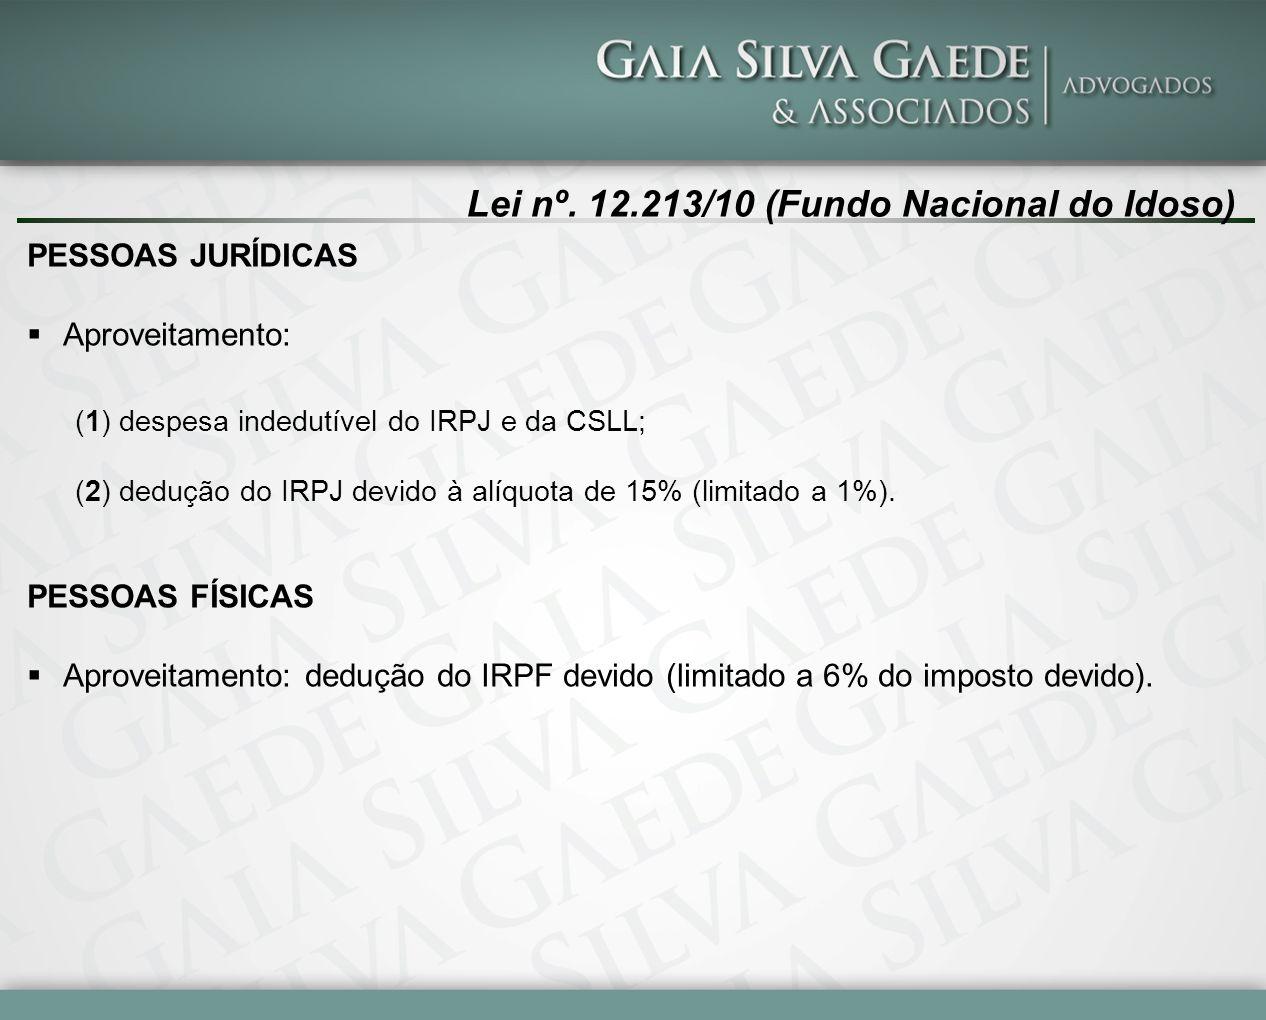 Lei nº. 12.213/10 (Fundo Nacional do Idoso)